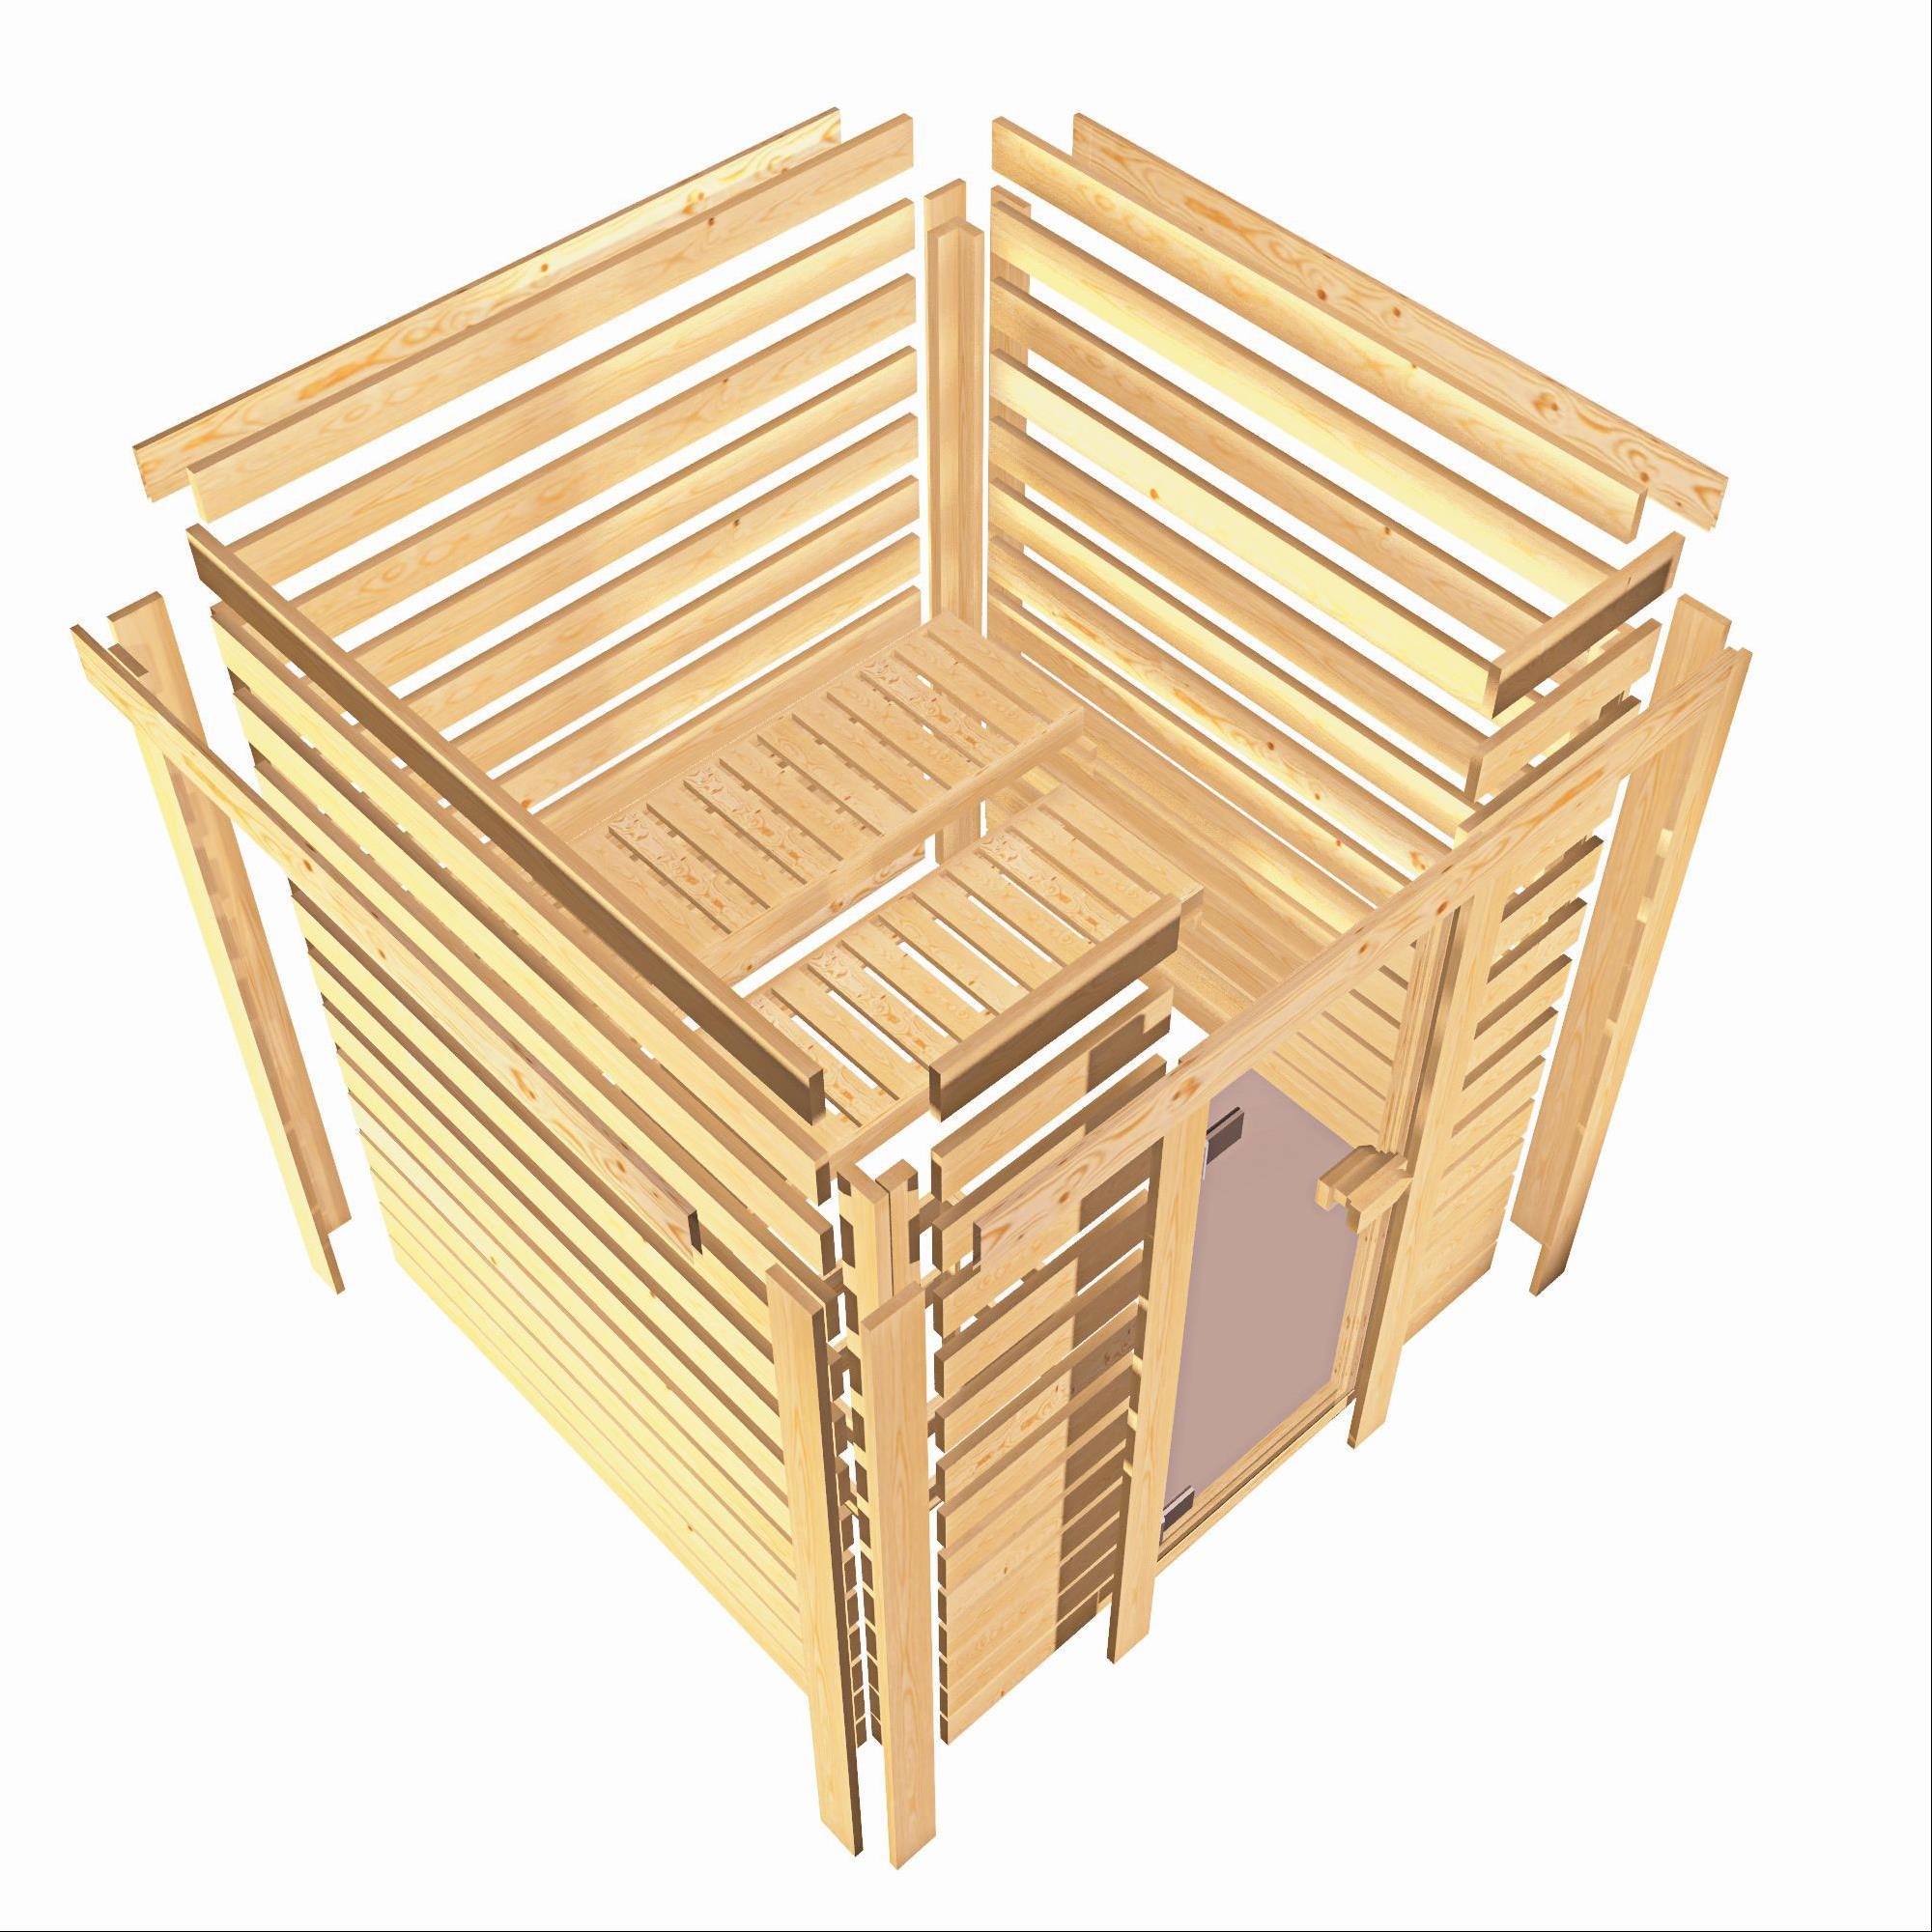 Woodfeeling Sauna Karla 38mm Kranz Ofen 9kW intern Tür Classic Bild 4